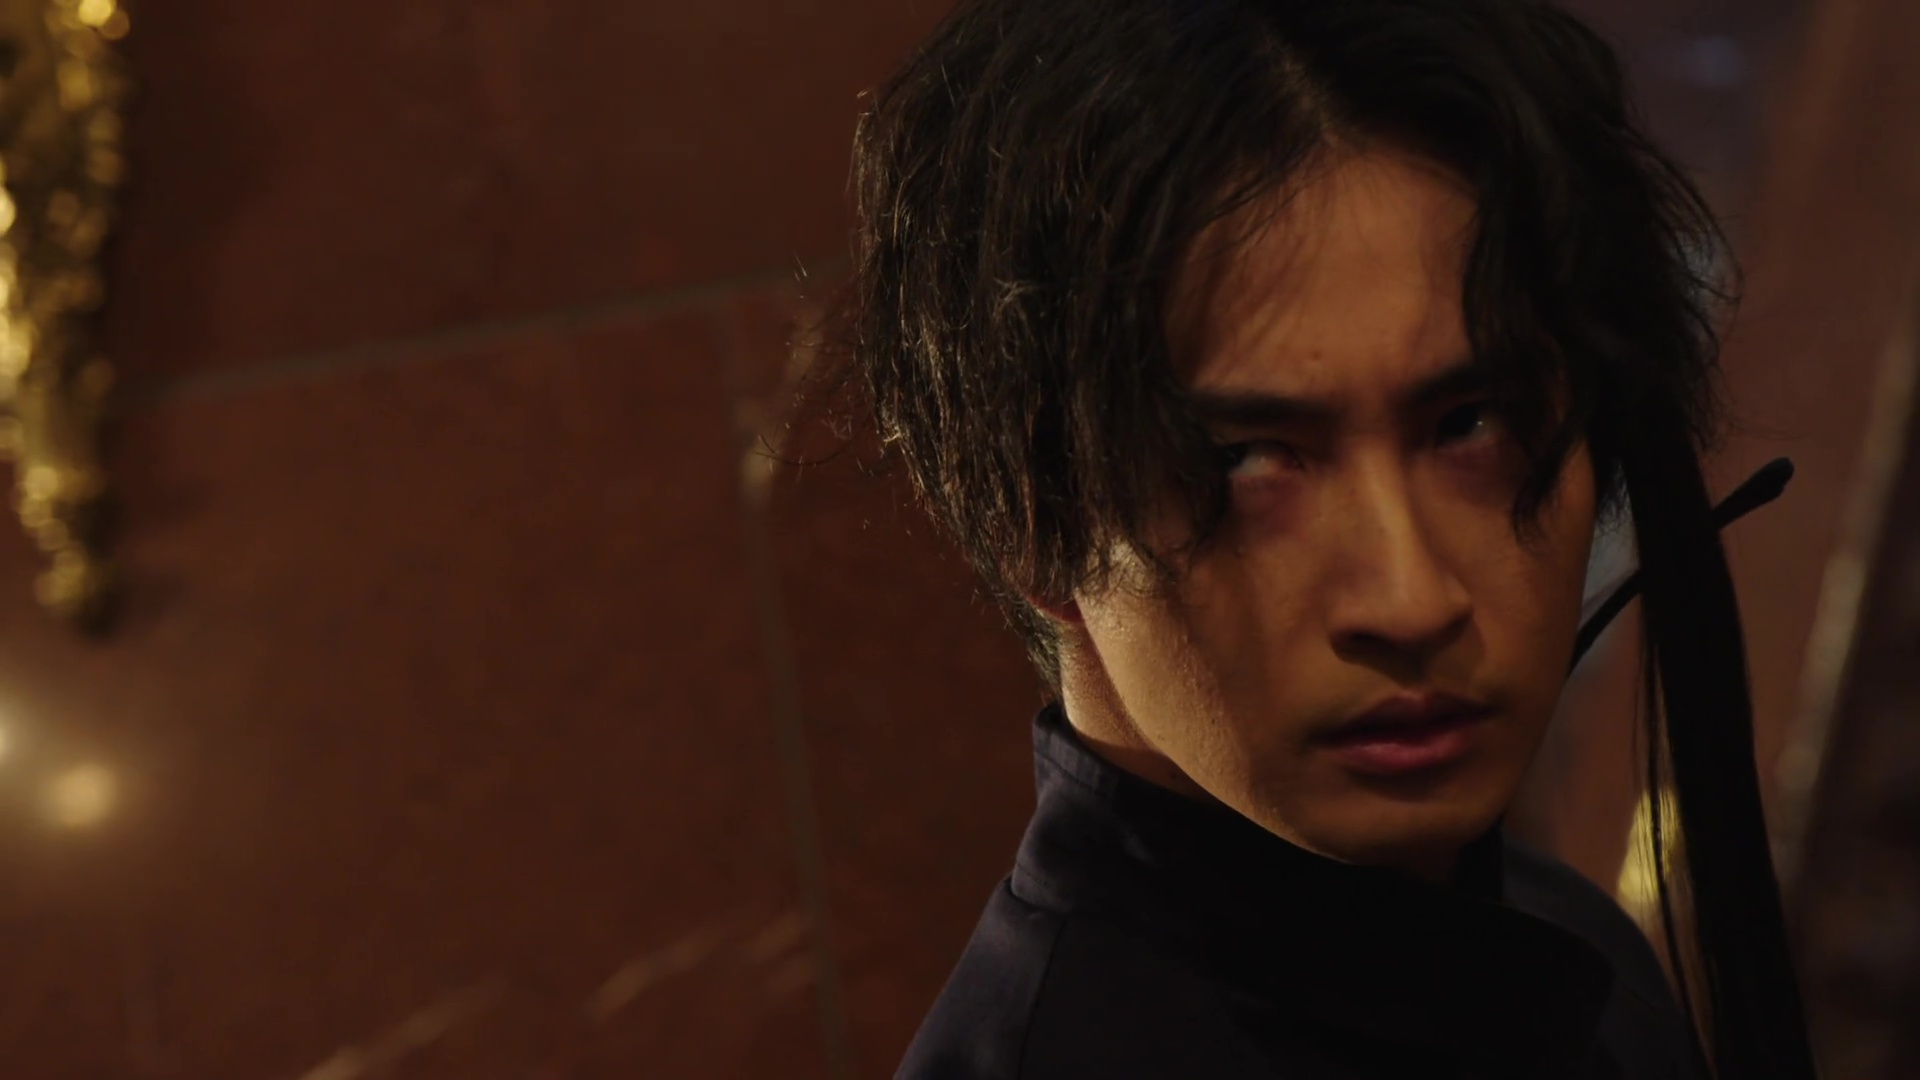 Kamen Rider Saber Episode 23 Recap